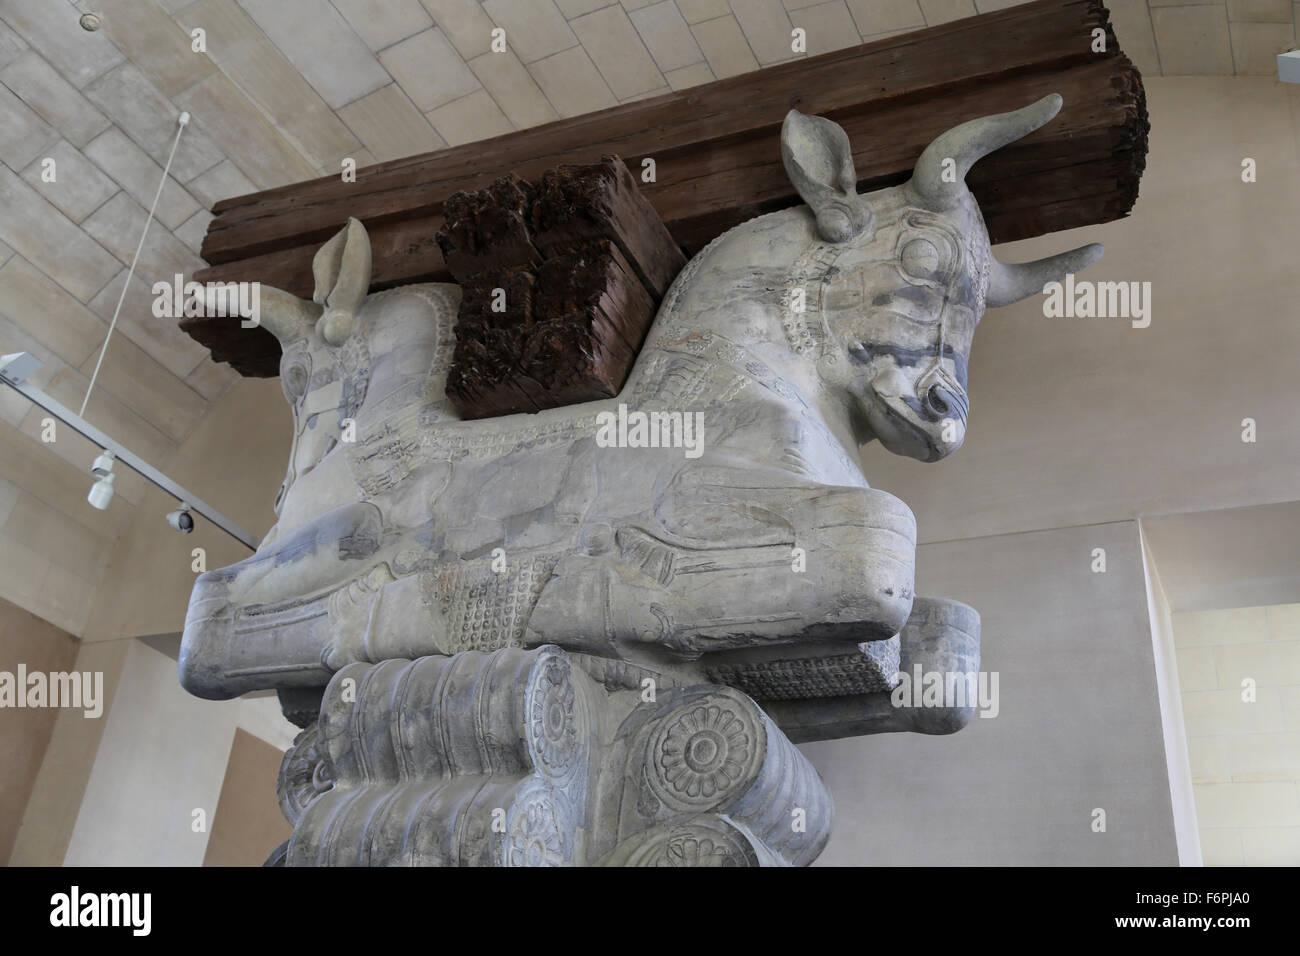 Capital column. Audience Chamber Hall. Apadama. Palace of Darius the Great. 5th century BC. Susa. Iran. Louvre Museum. - Stock Image